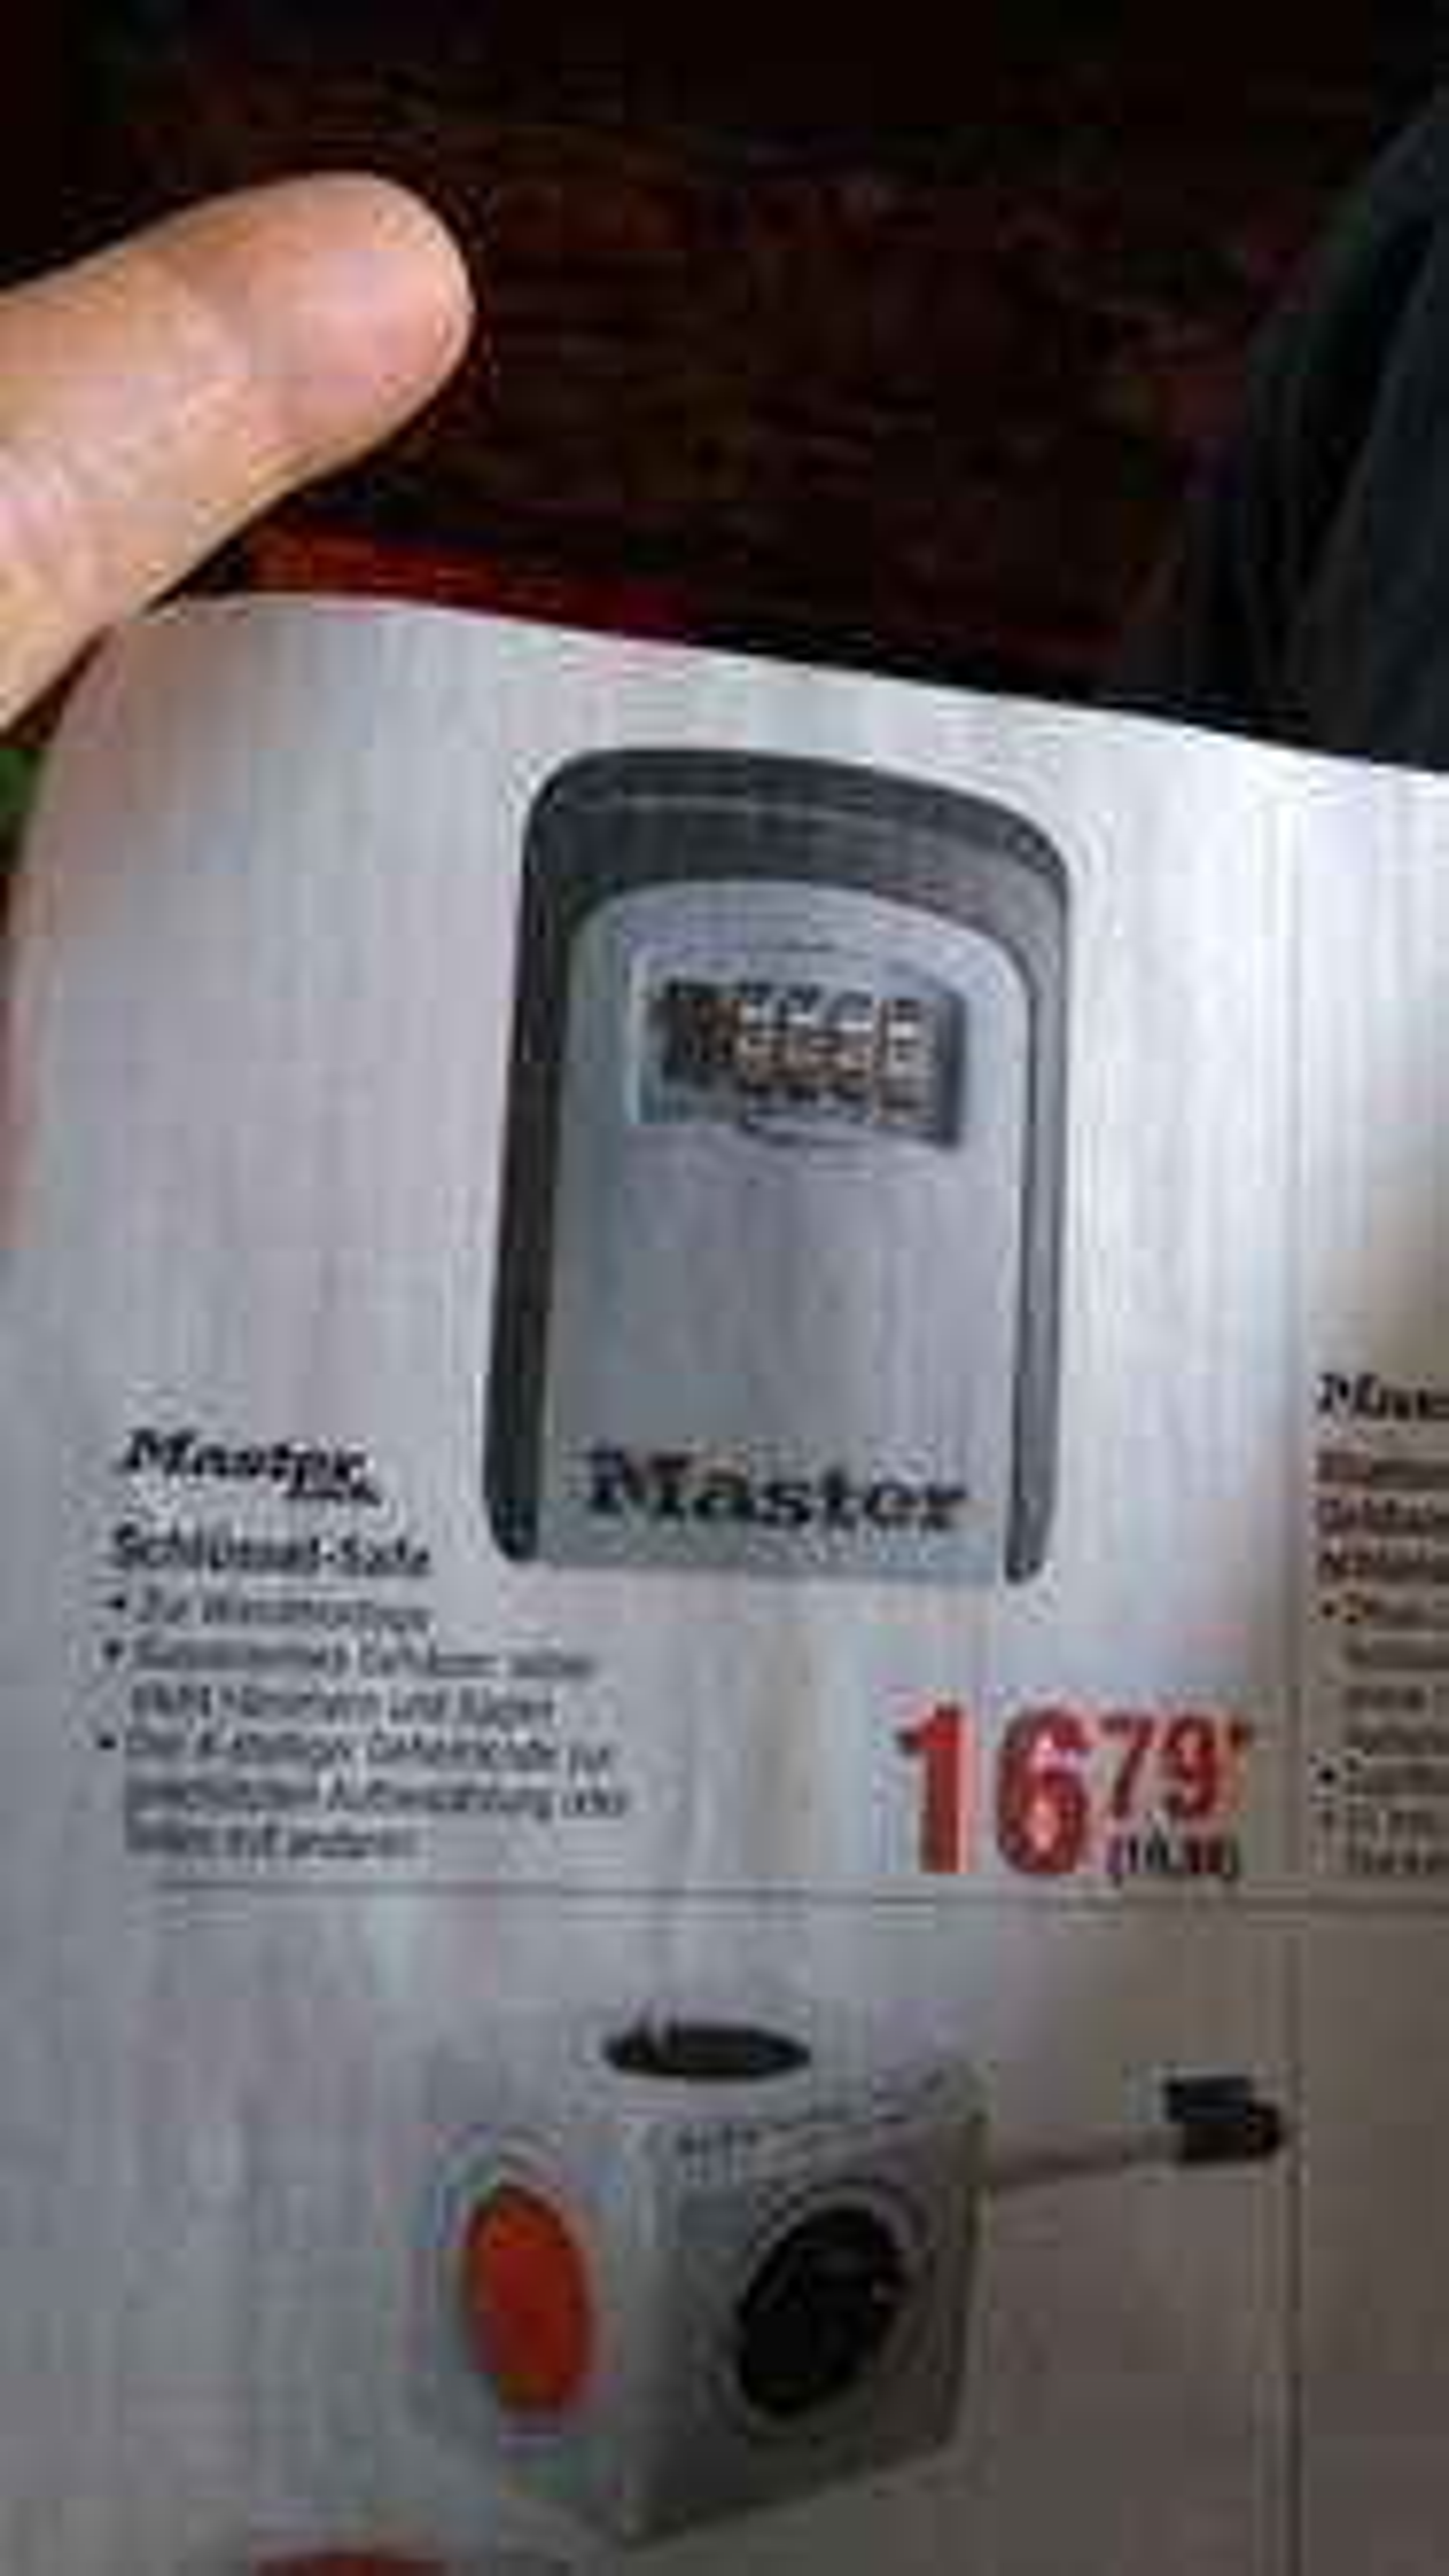 [METRO] Masterlock Schlüssel-Safe PVG 25,95